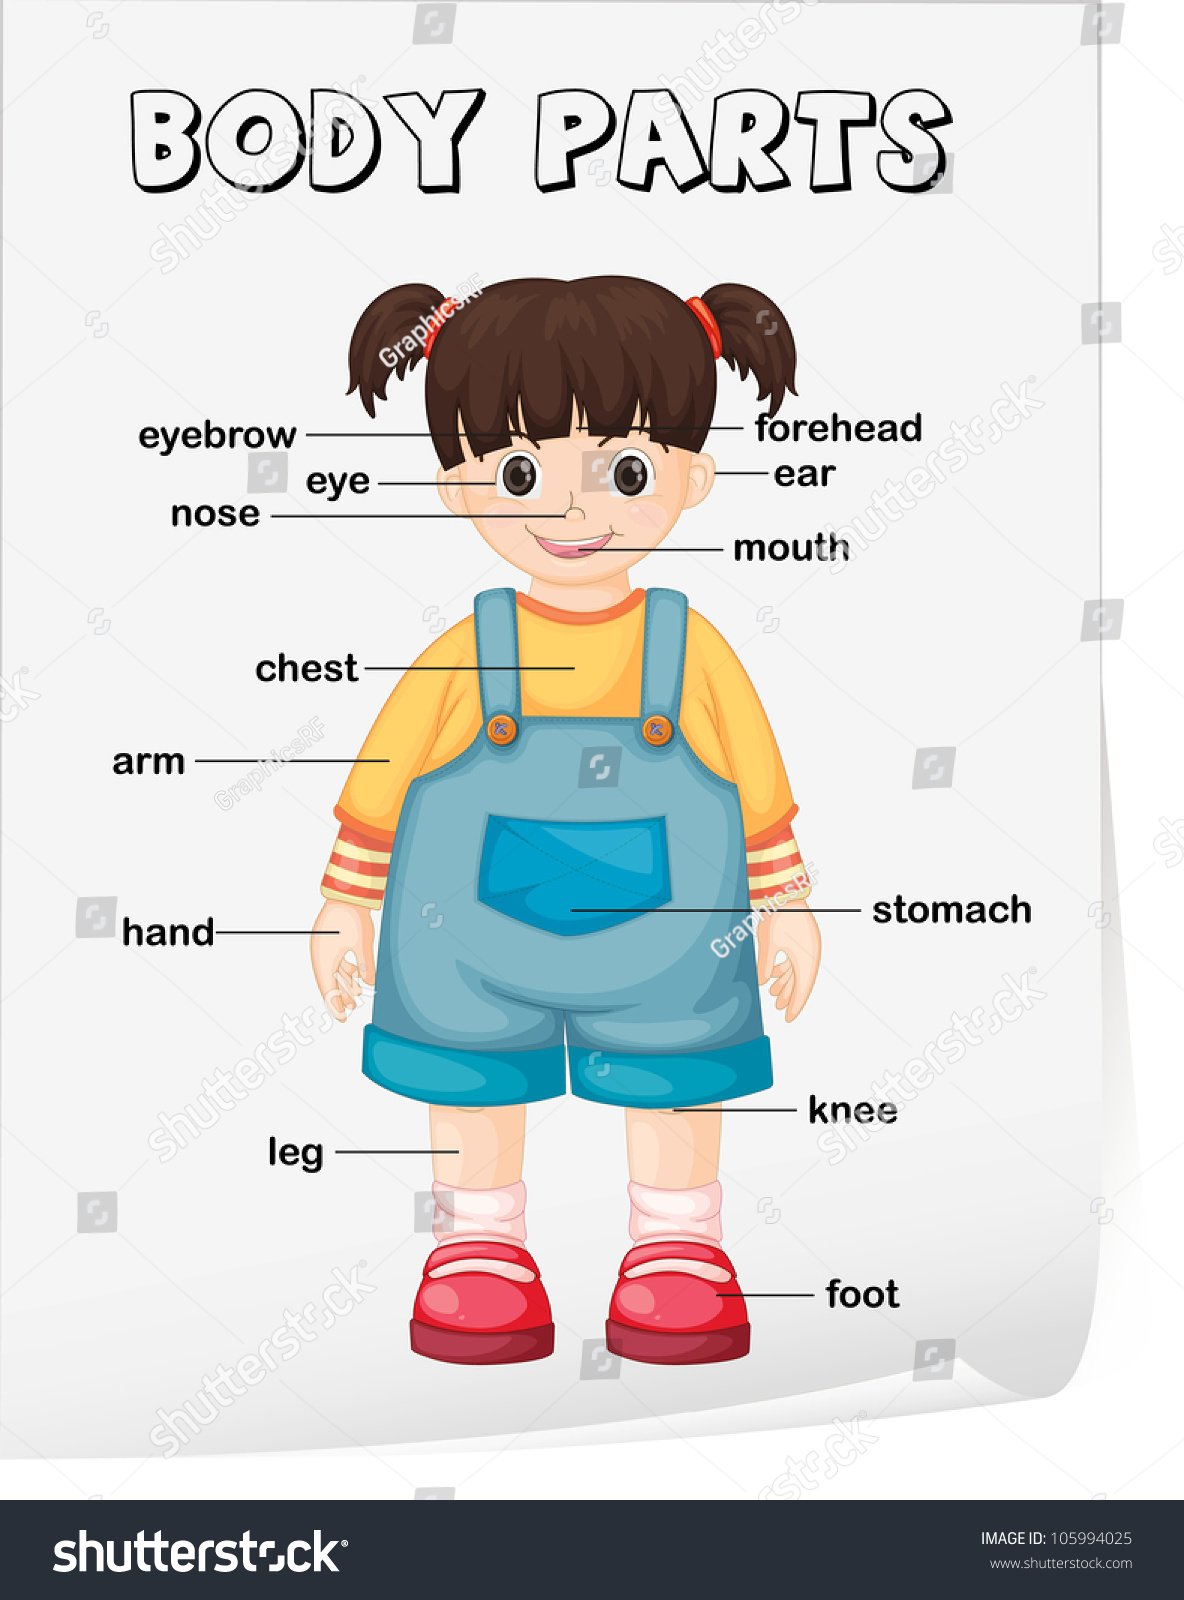 worksheet Parts Of The Body Worksheet royalty free vocabulary worksheet parts of the body 105994025 105994025